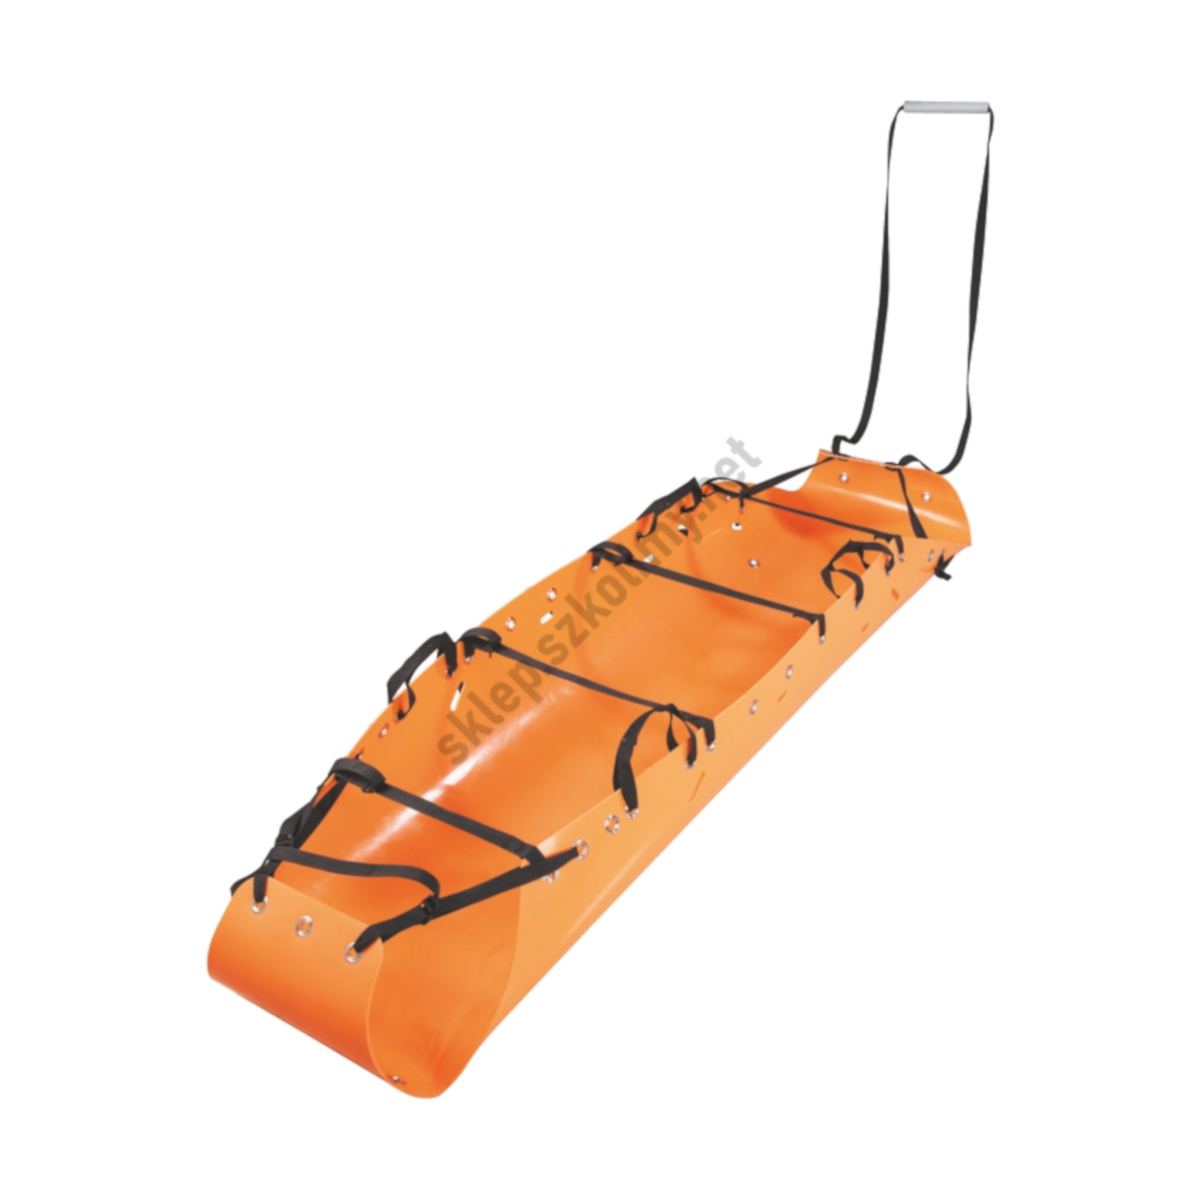 Nosze ewakuacyjne typu SKED